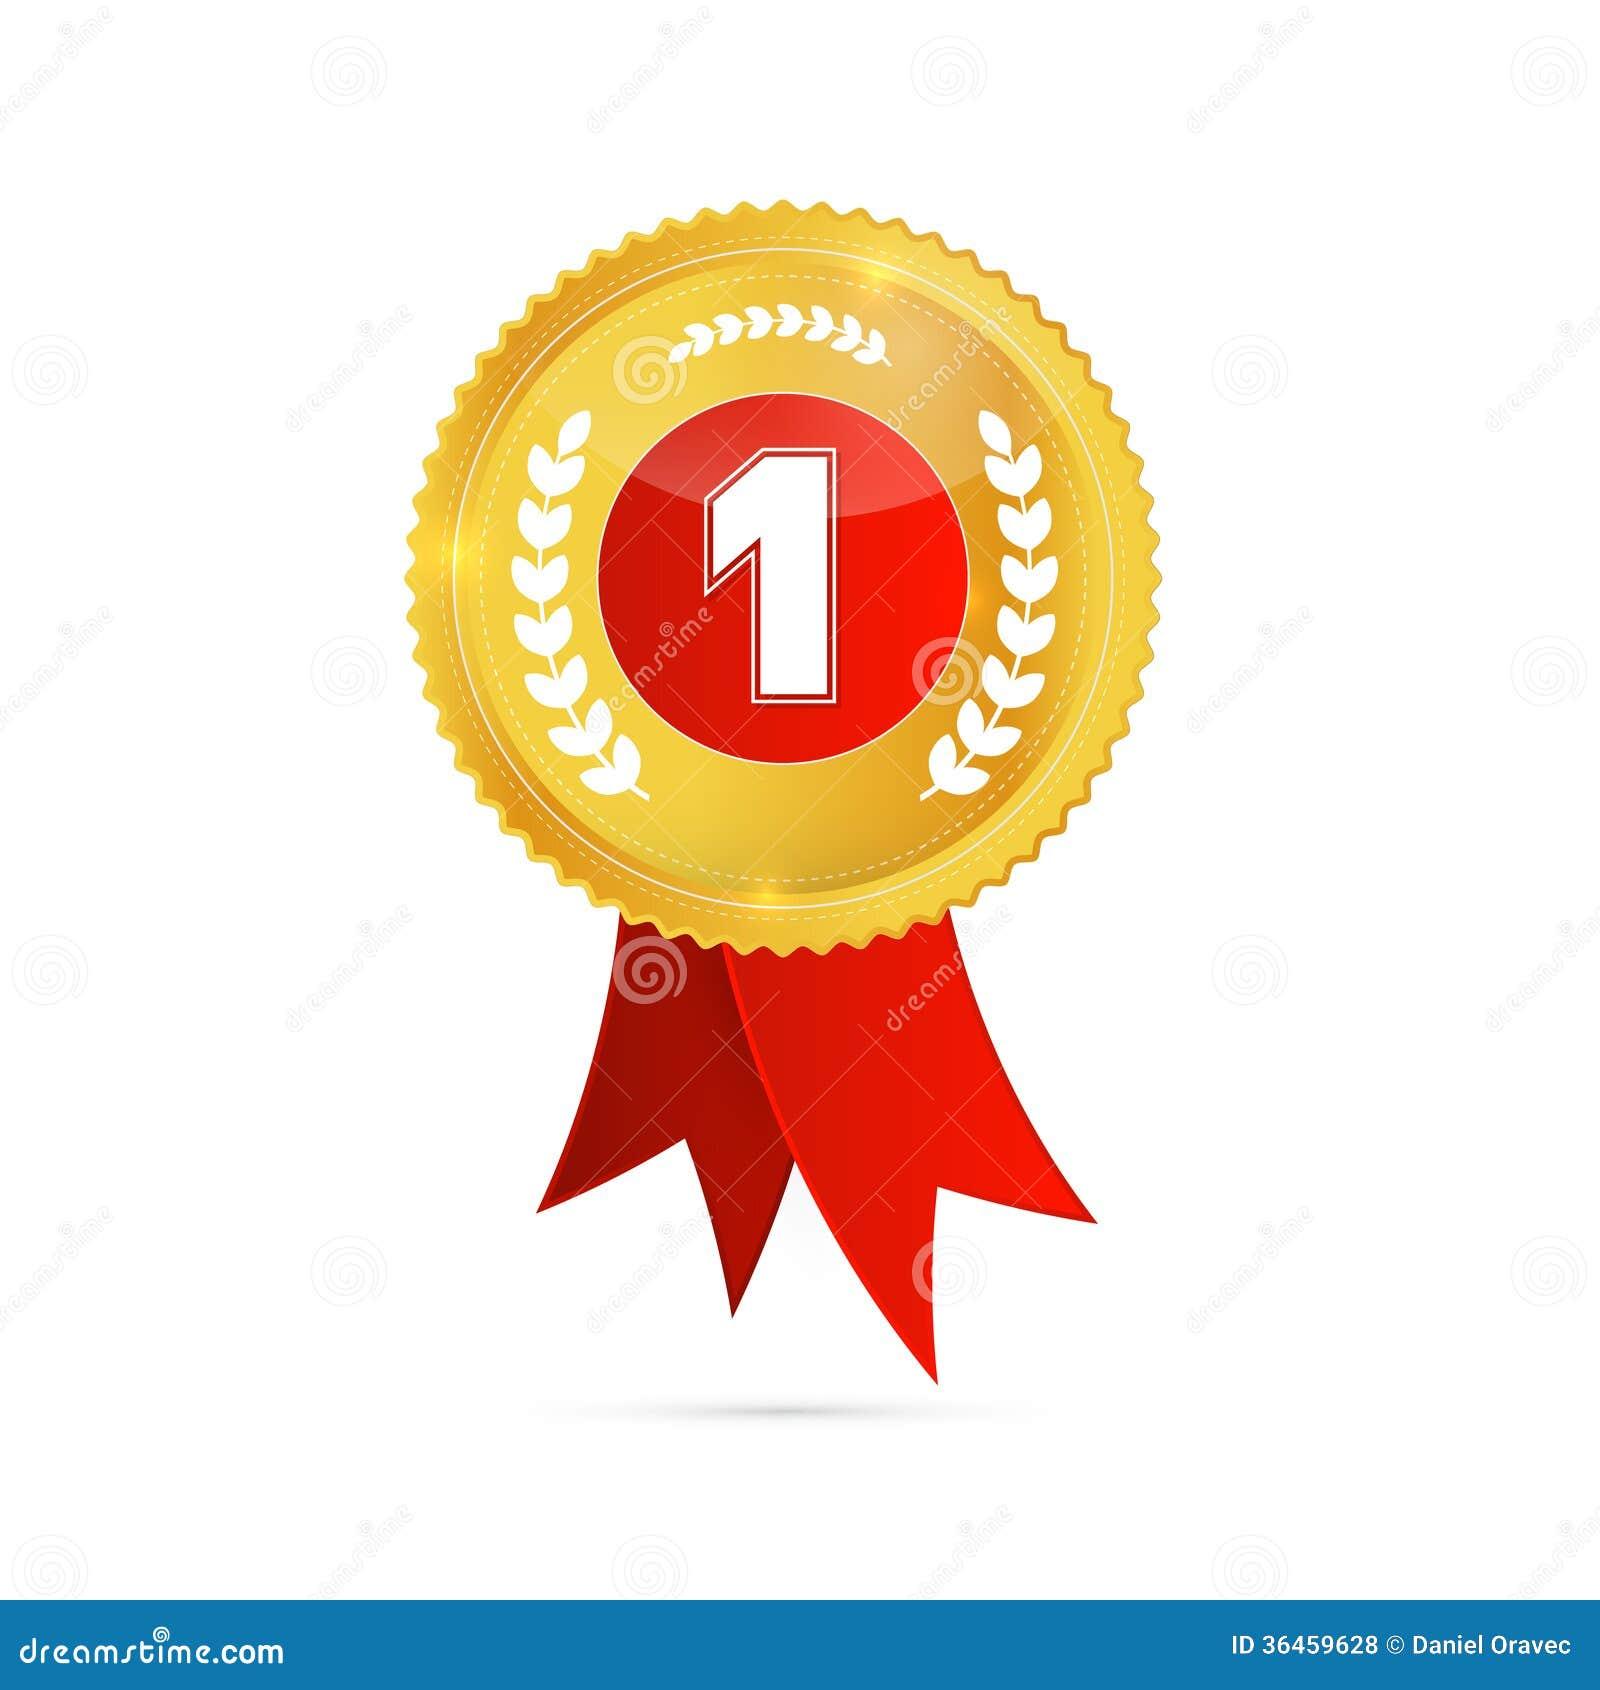 Medaglia de oro 1 - 2 5